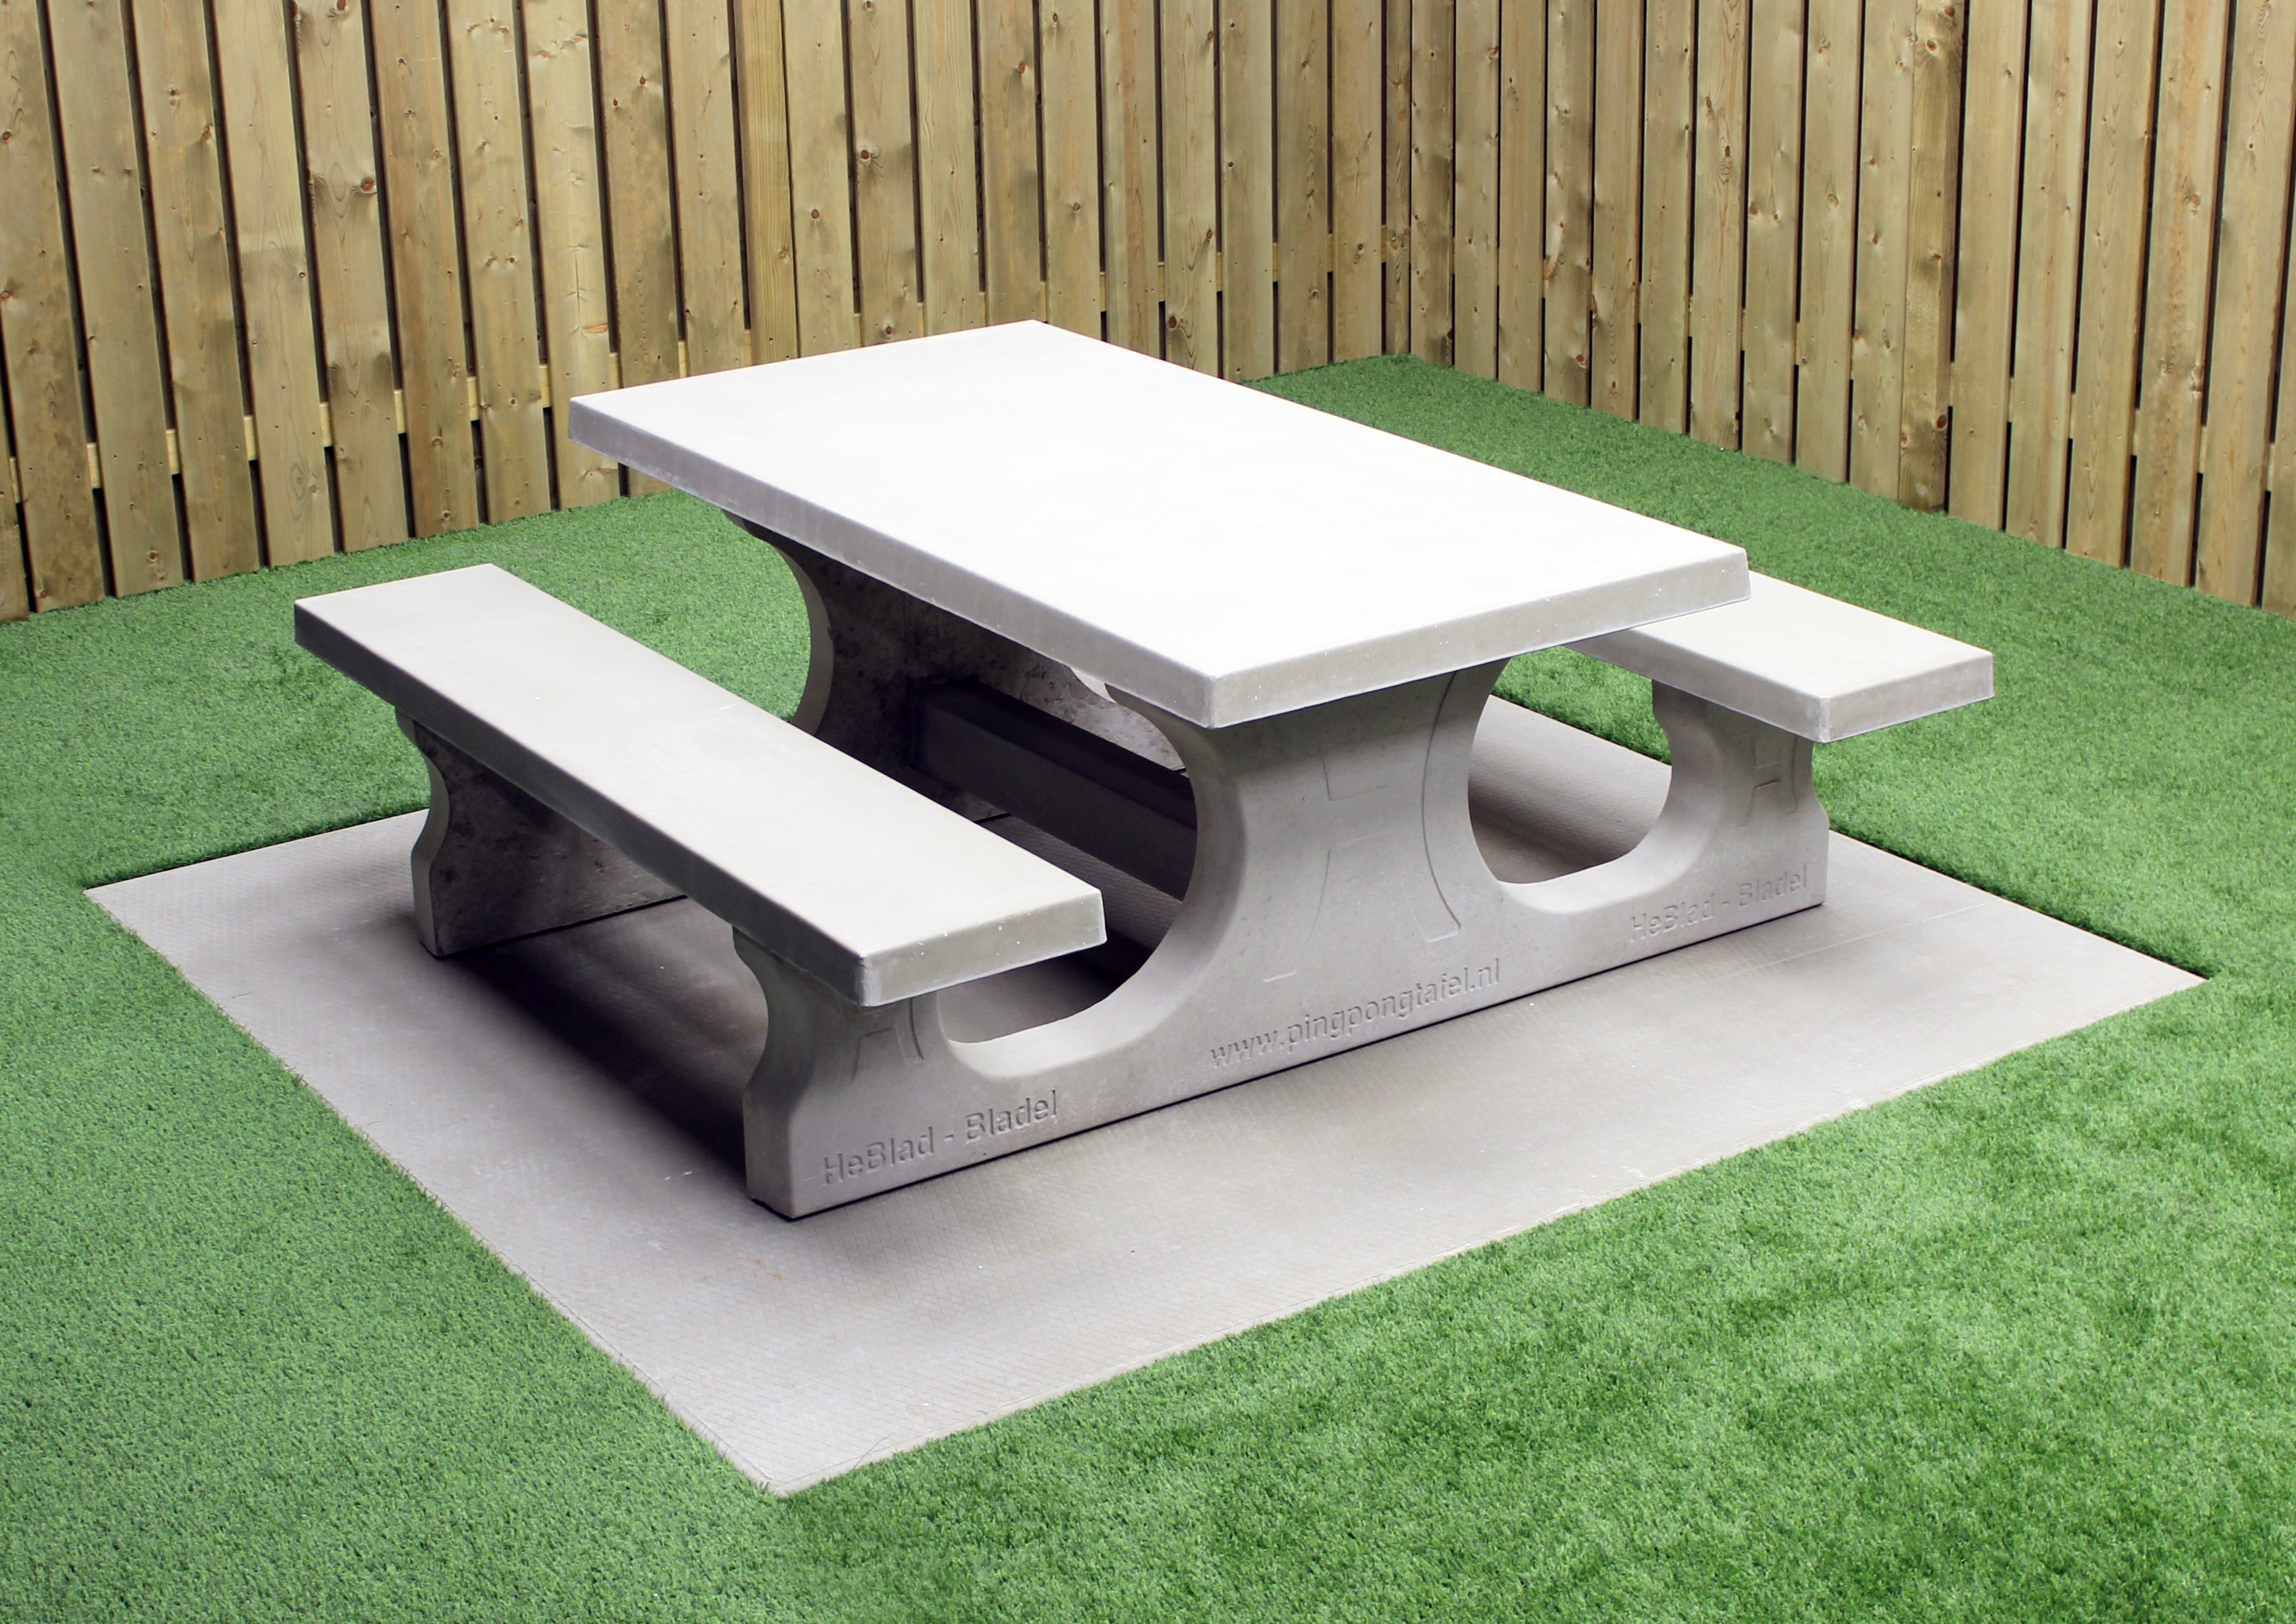 Outdoor Concrete Picnic Tables Madison Art Center Design